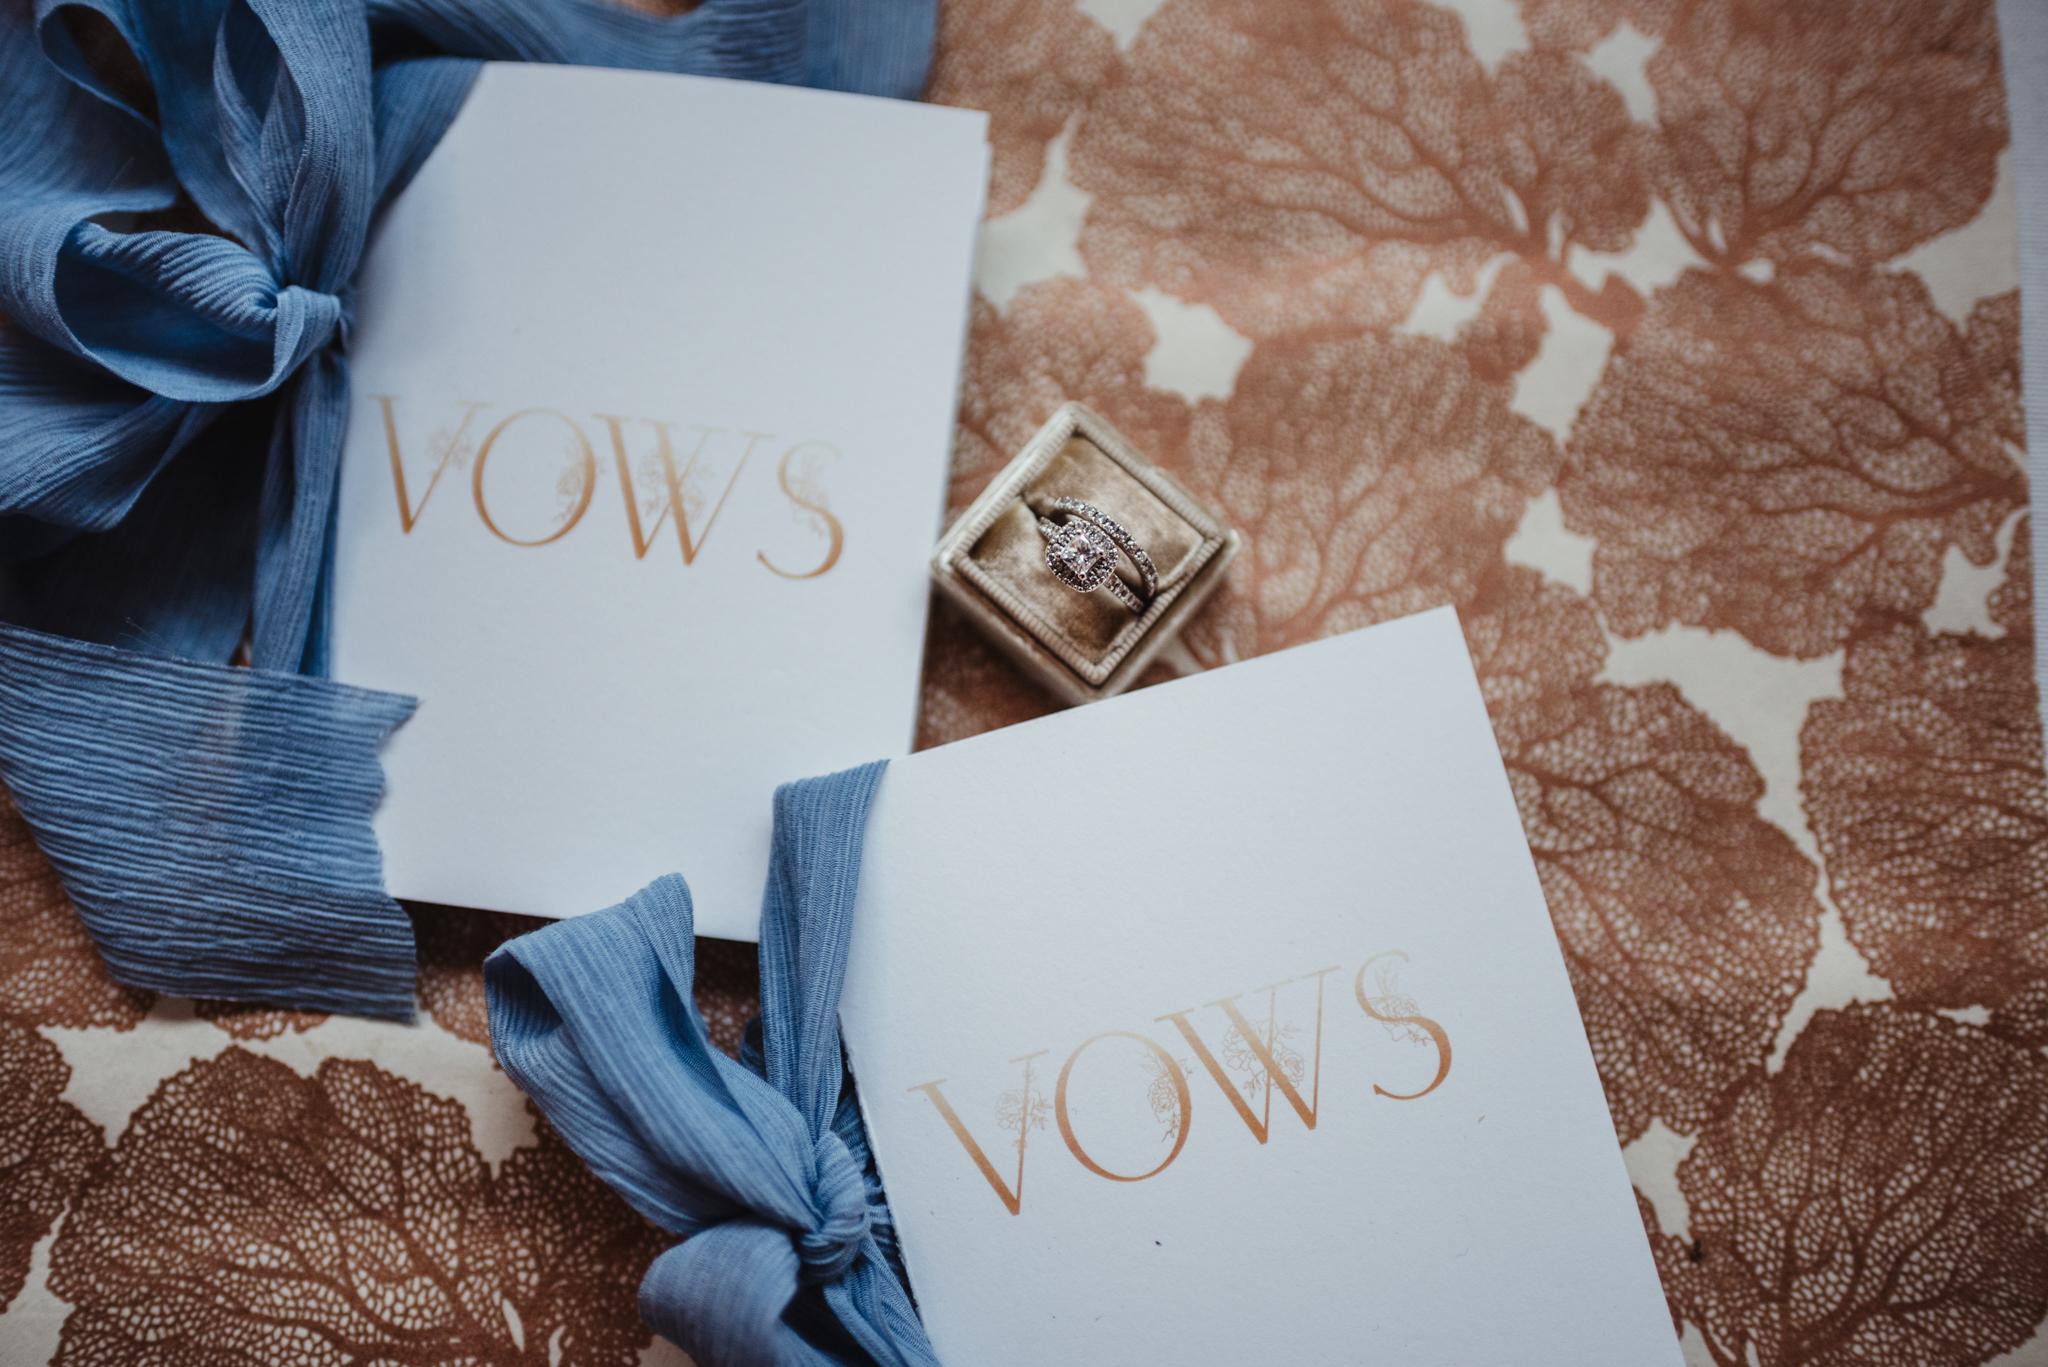 raleigh-wedding-photographer-beach-wedding-details-rings-and-vows.jpg